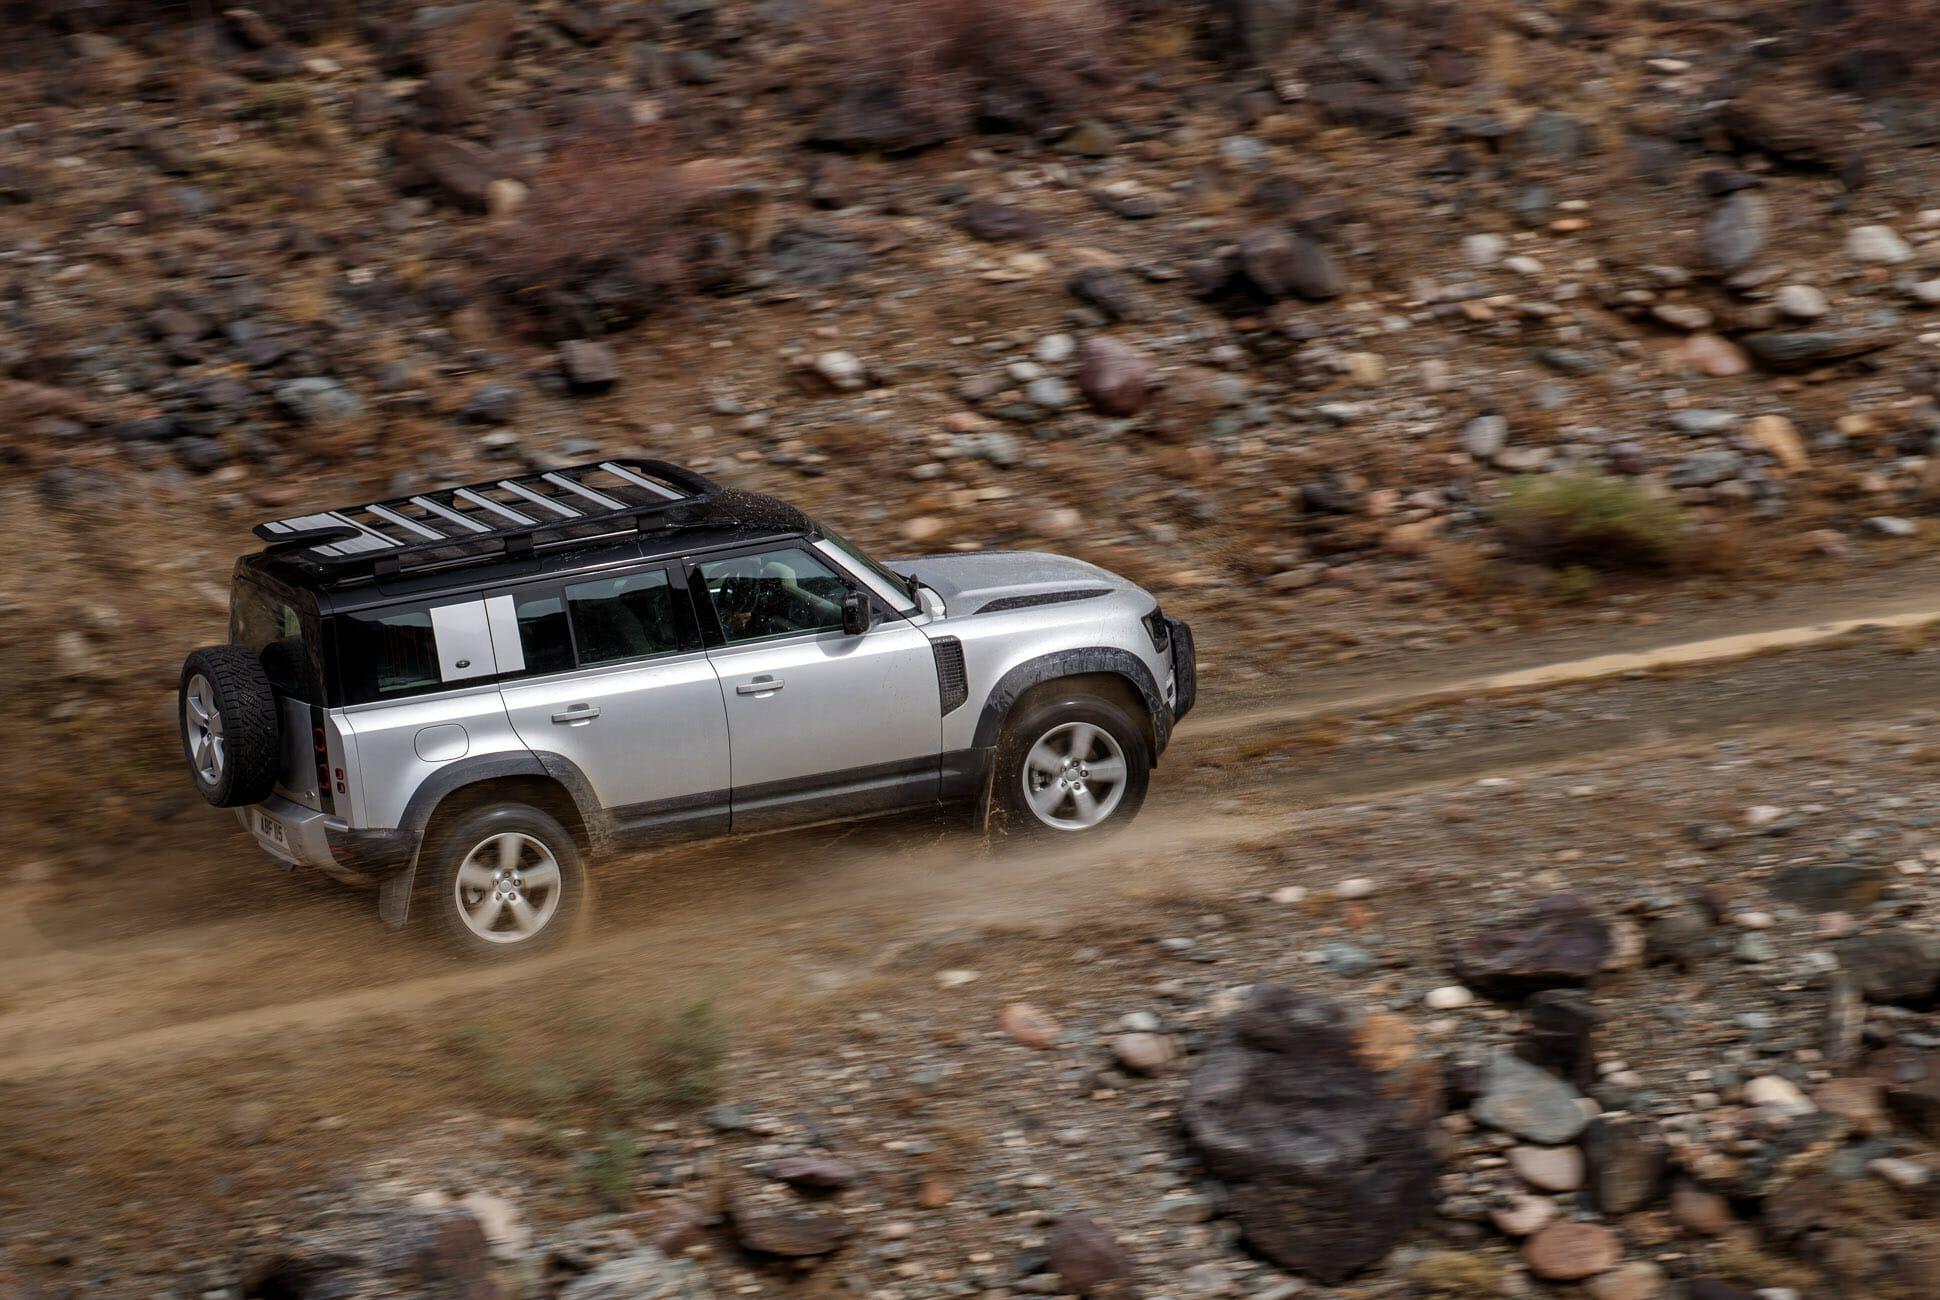 Land Rover Defender Gear Patrol-Exterior Action-Slide-23